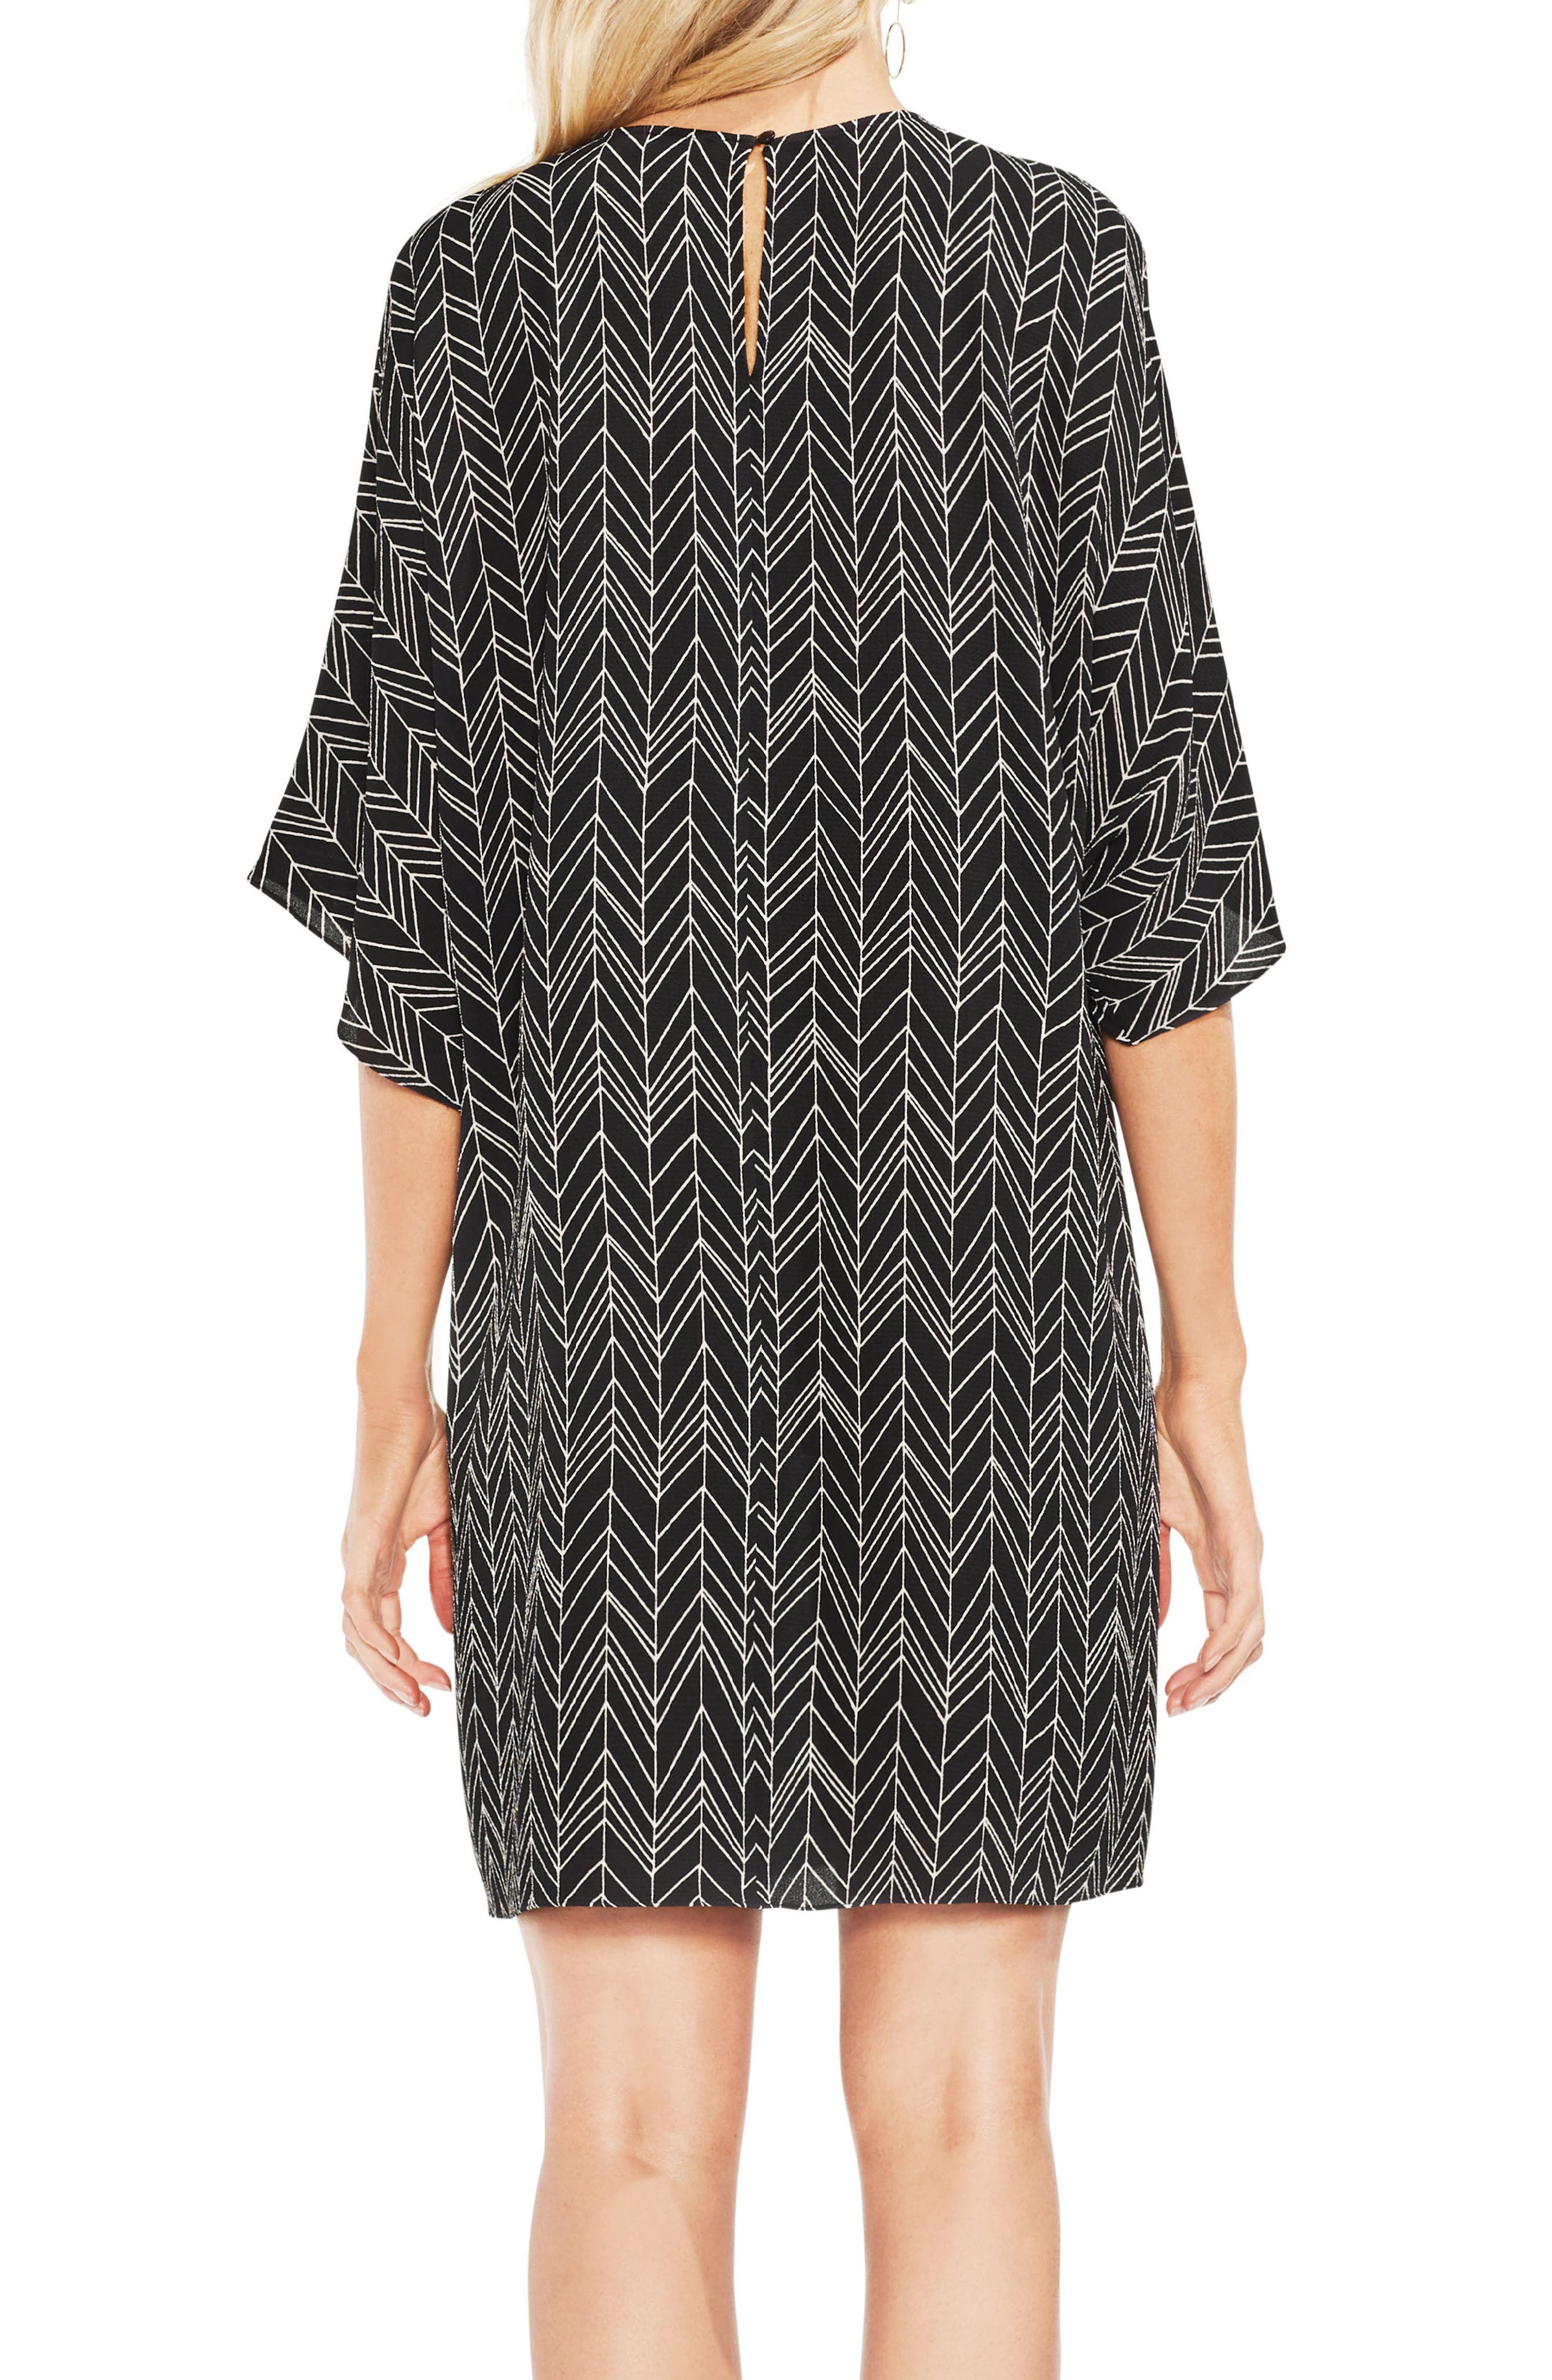 Herringbone Graphic Dress,                             Alternate thumbnail 2, color,                             001